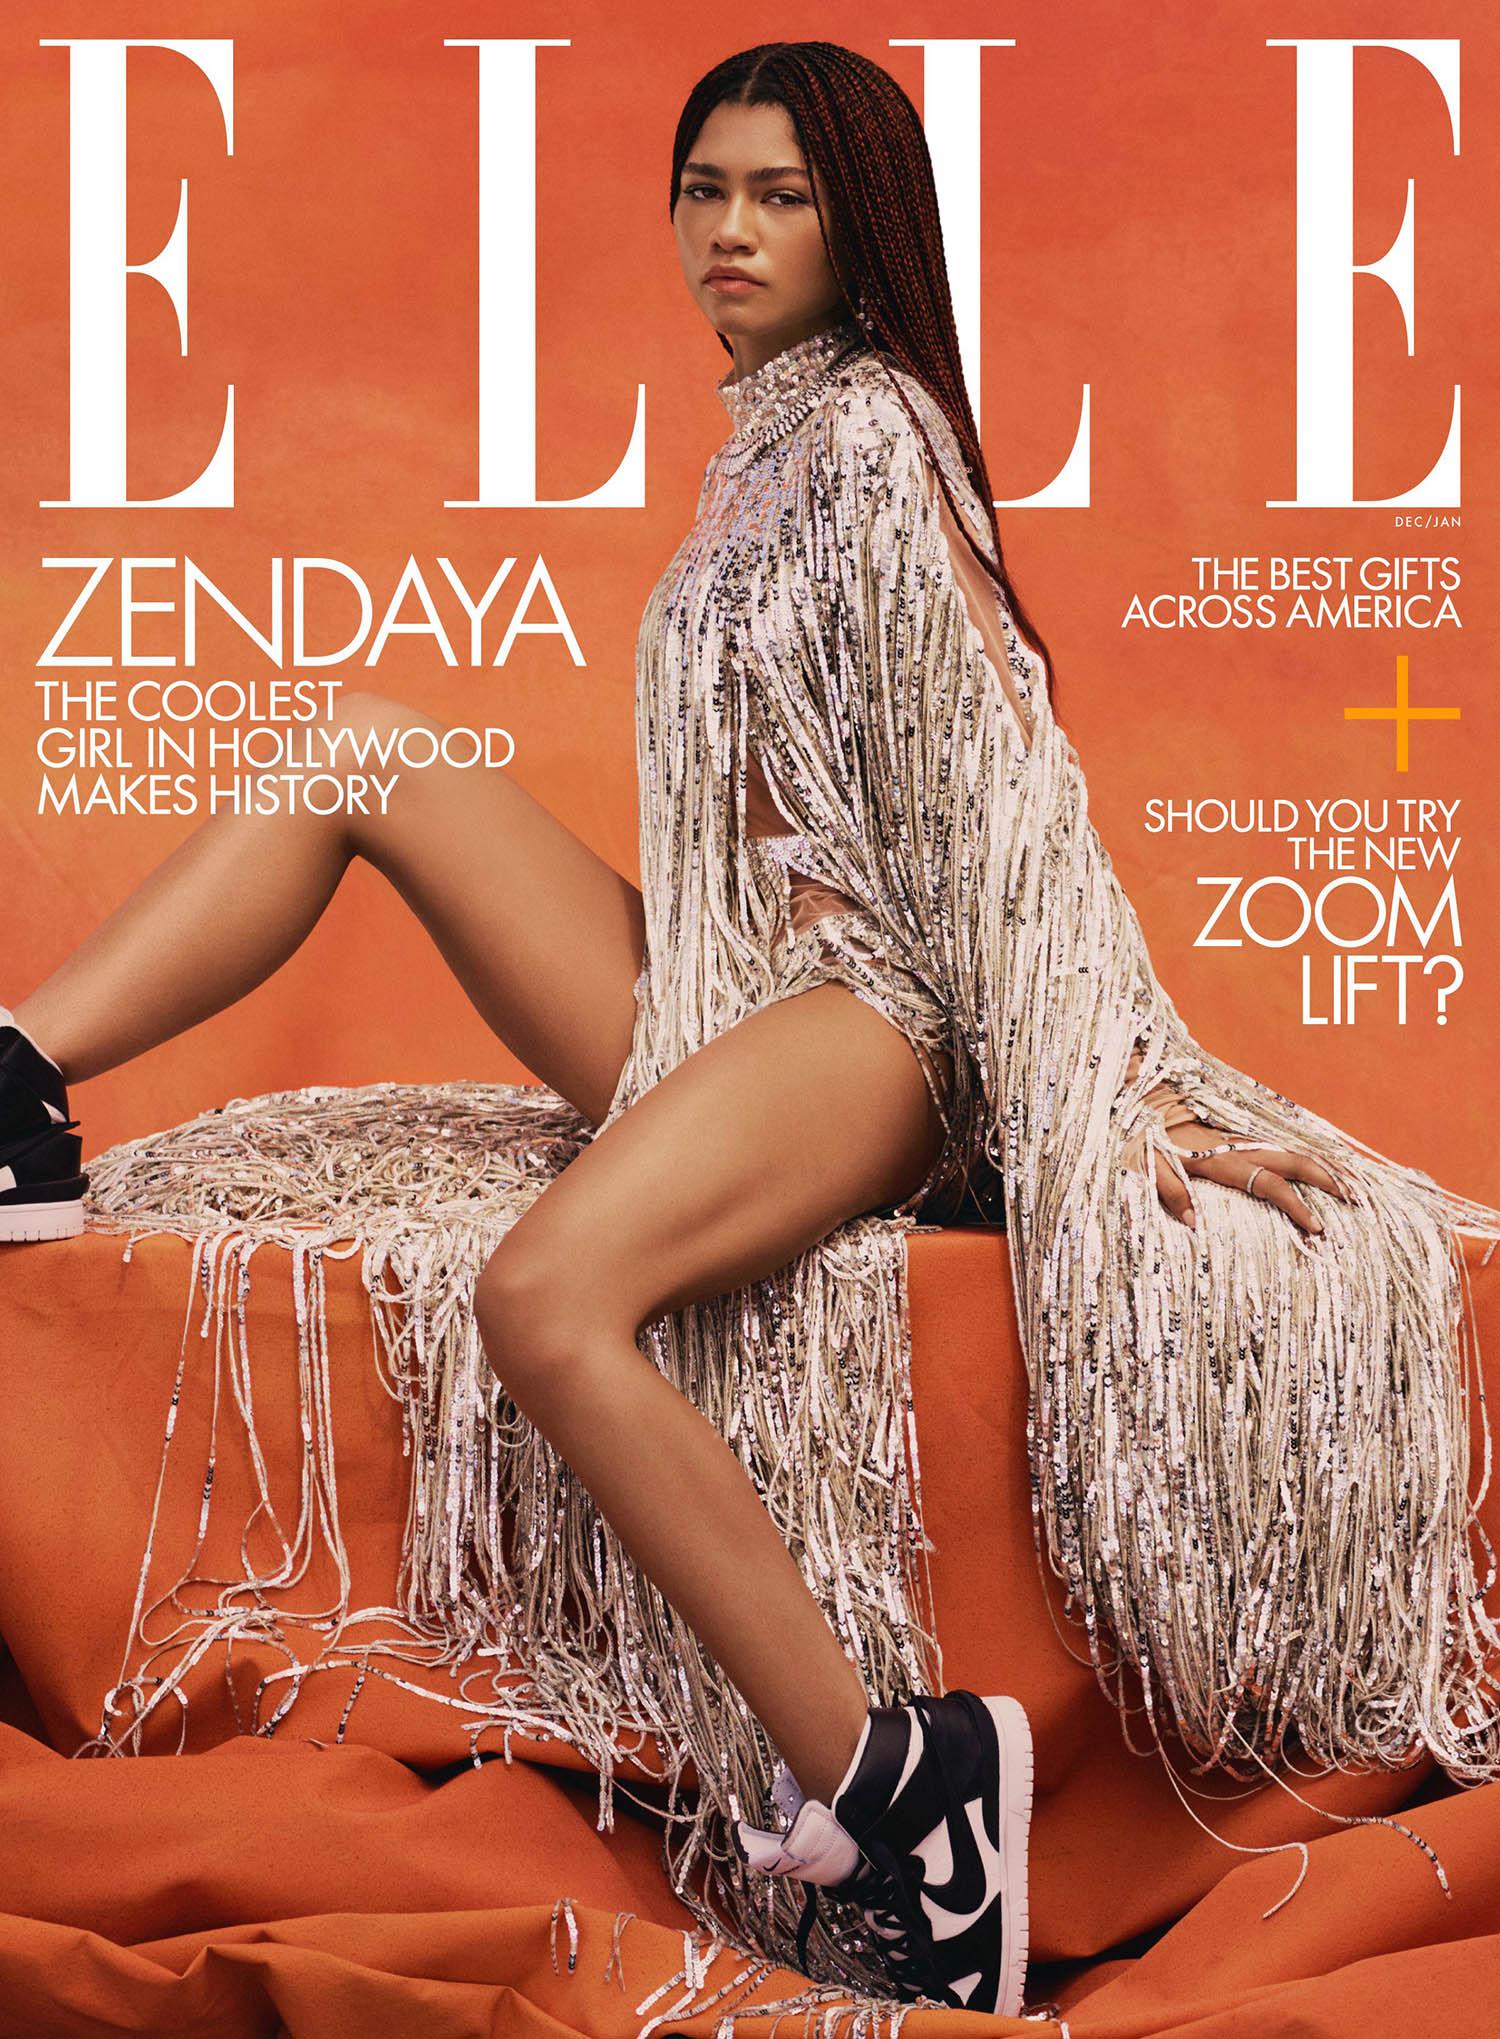 Zendaya covers Elle US December 2020 January 2021 by Micaiah Carter